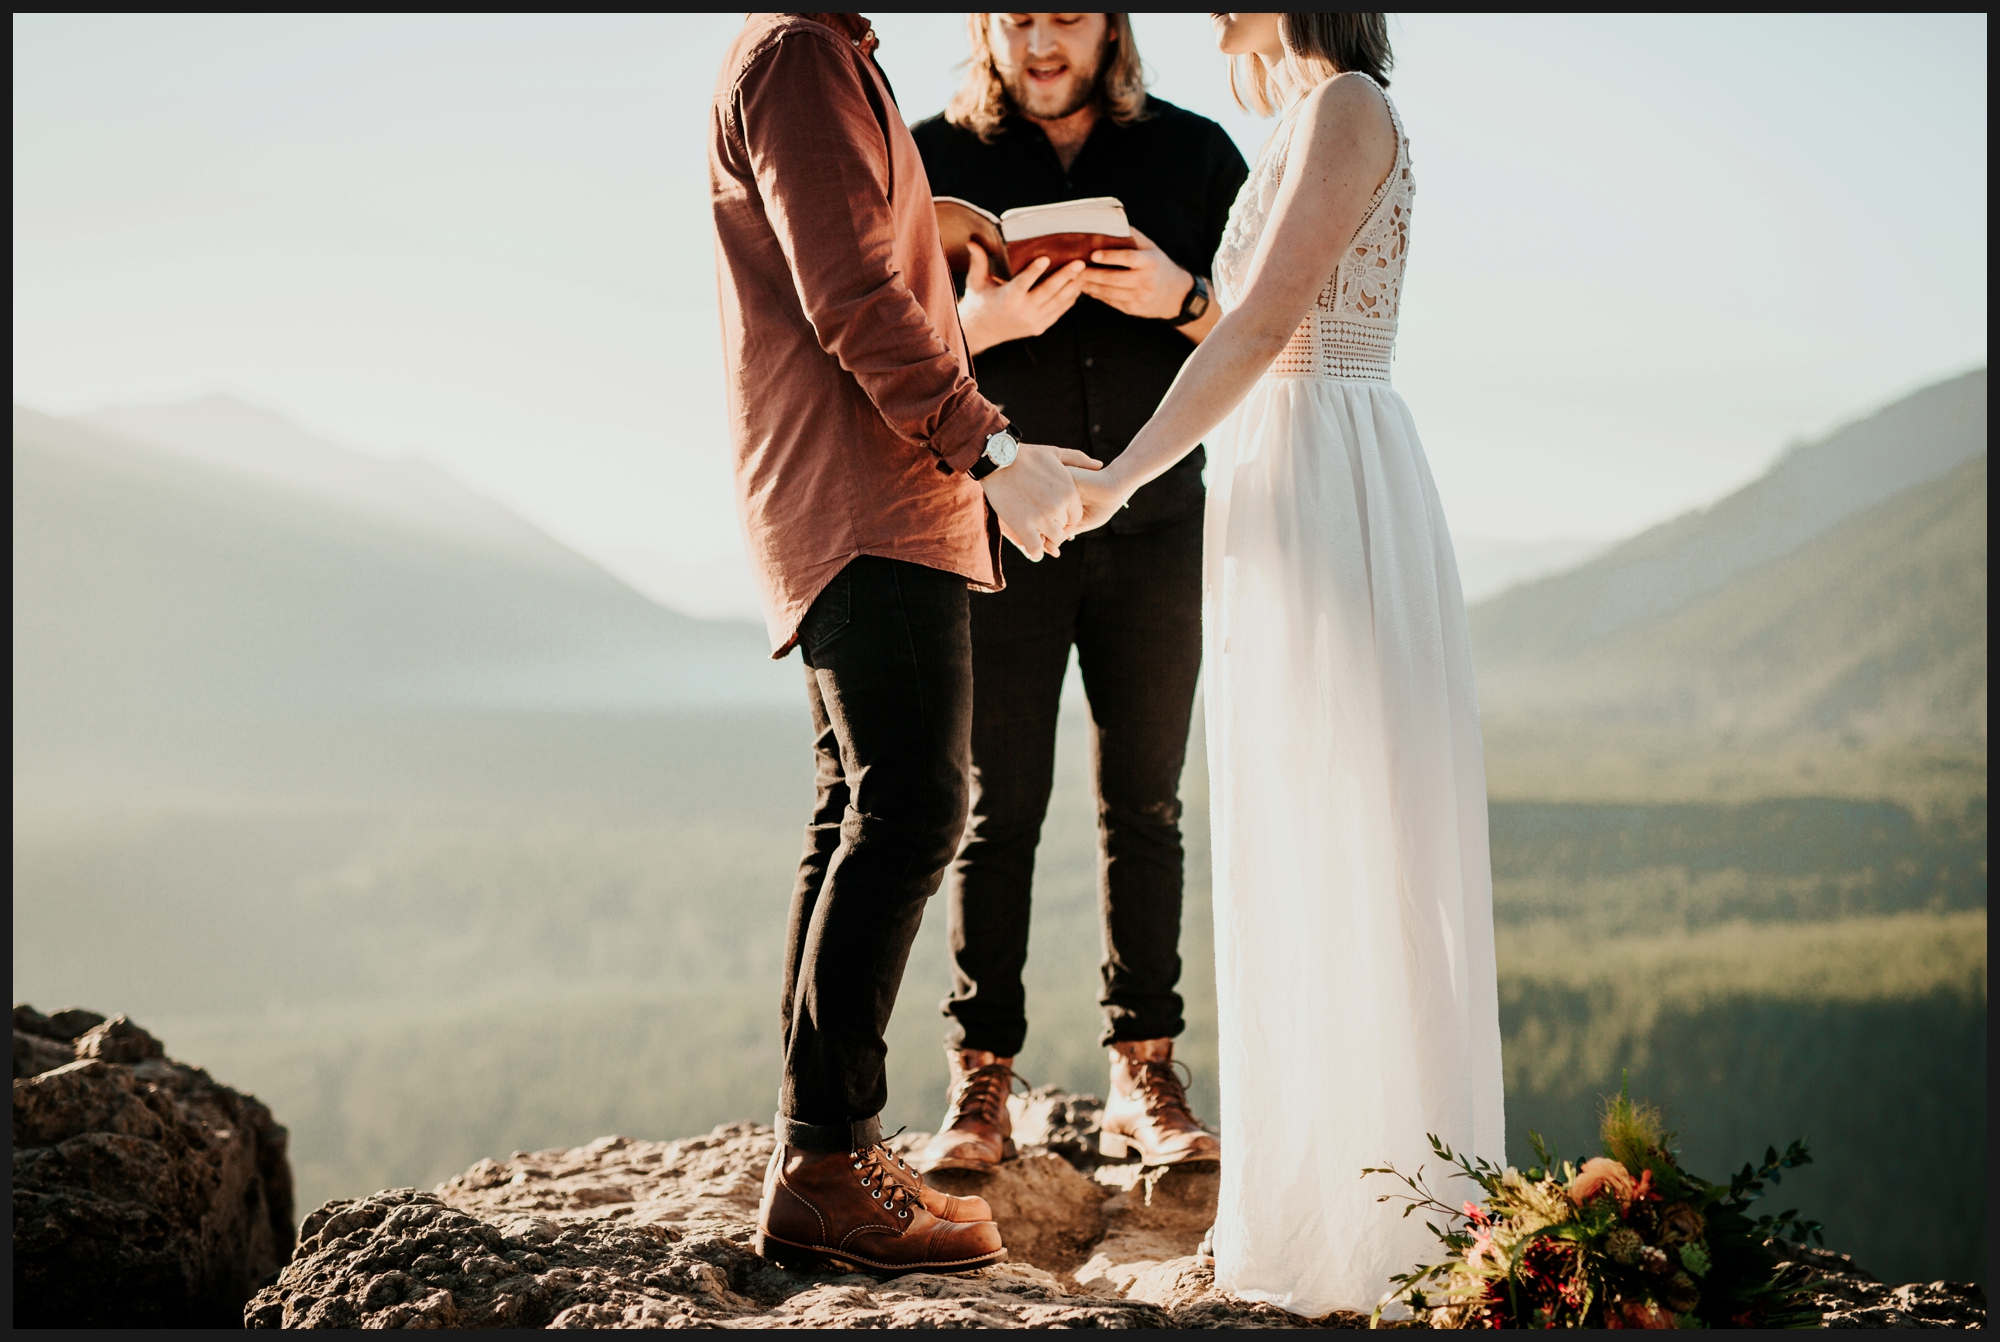 Orlando-Wedding-Photographer-destination-wedding-photographer-florida-wedding-photographer-bohemian-wedding-photographer_0448.jpg